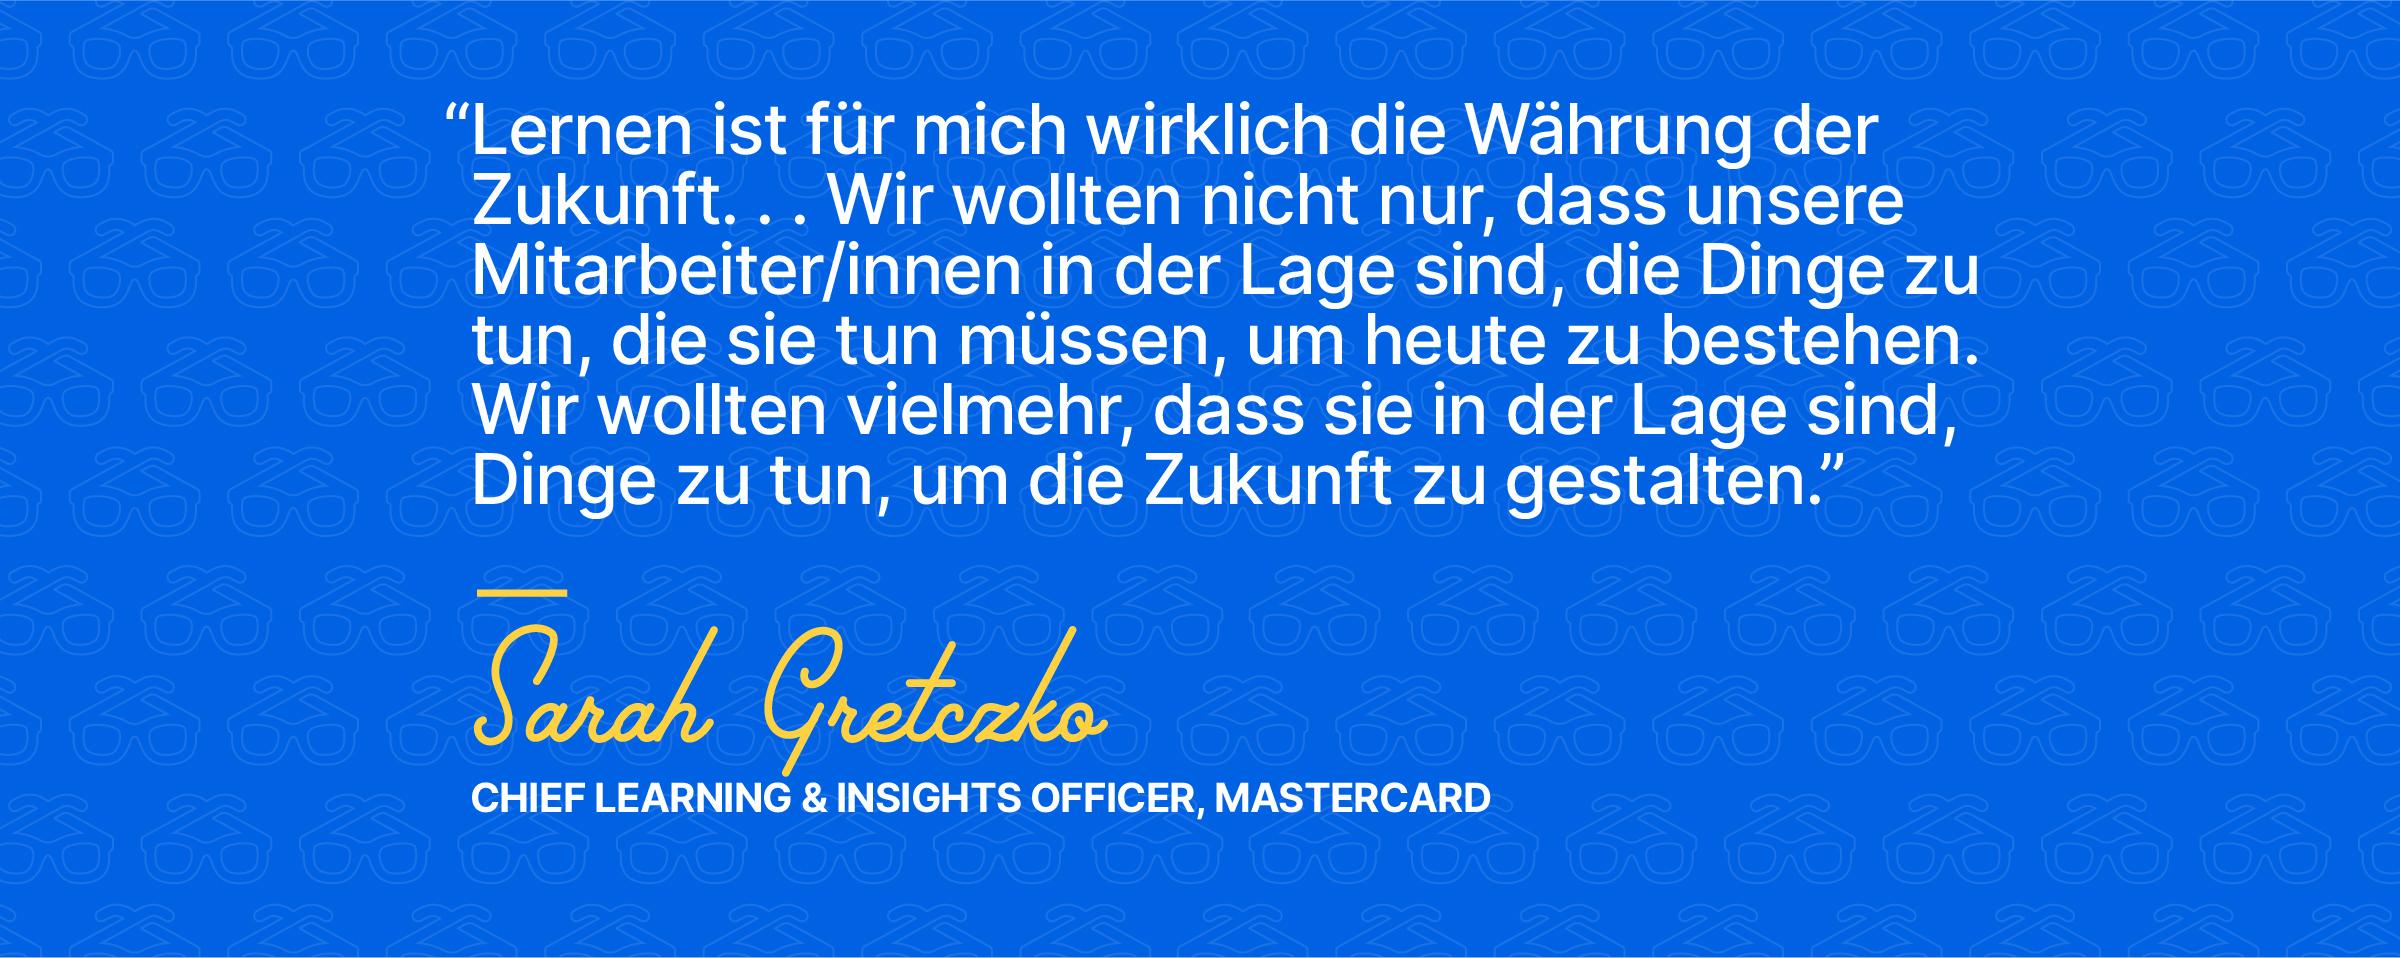 2020_LENS_Lite_Hubspot_Mastercard_ImageQuote_German@1x